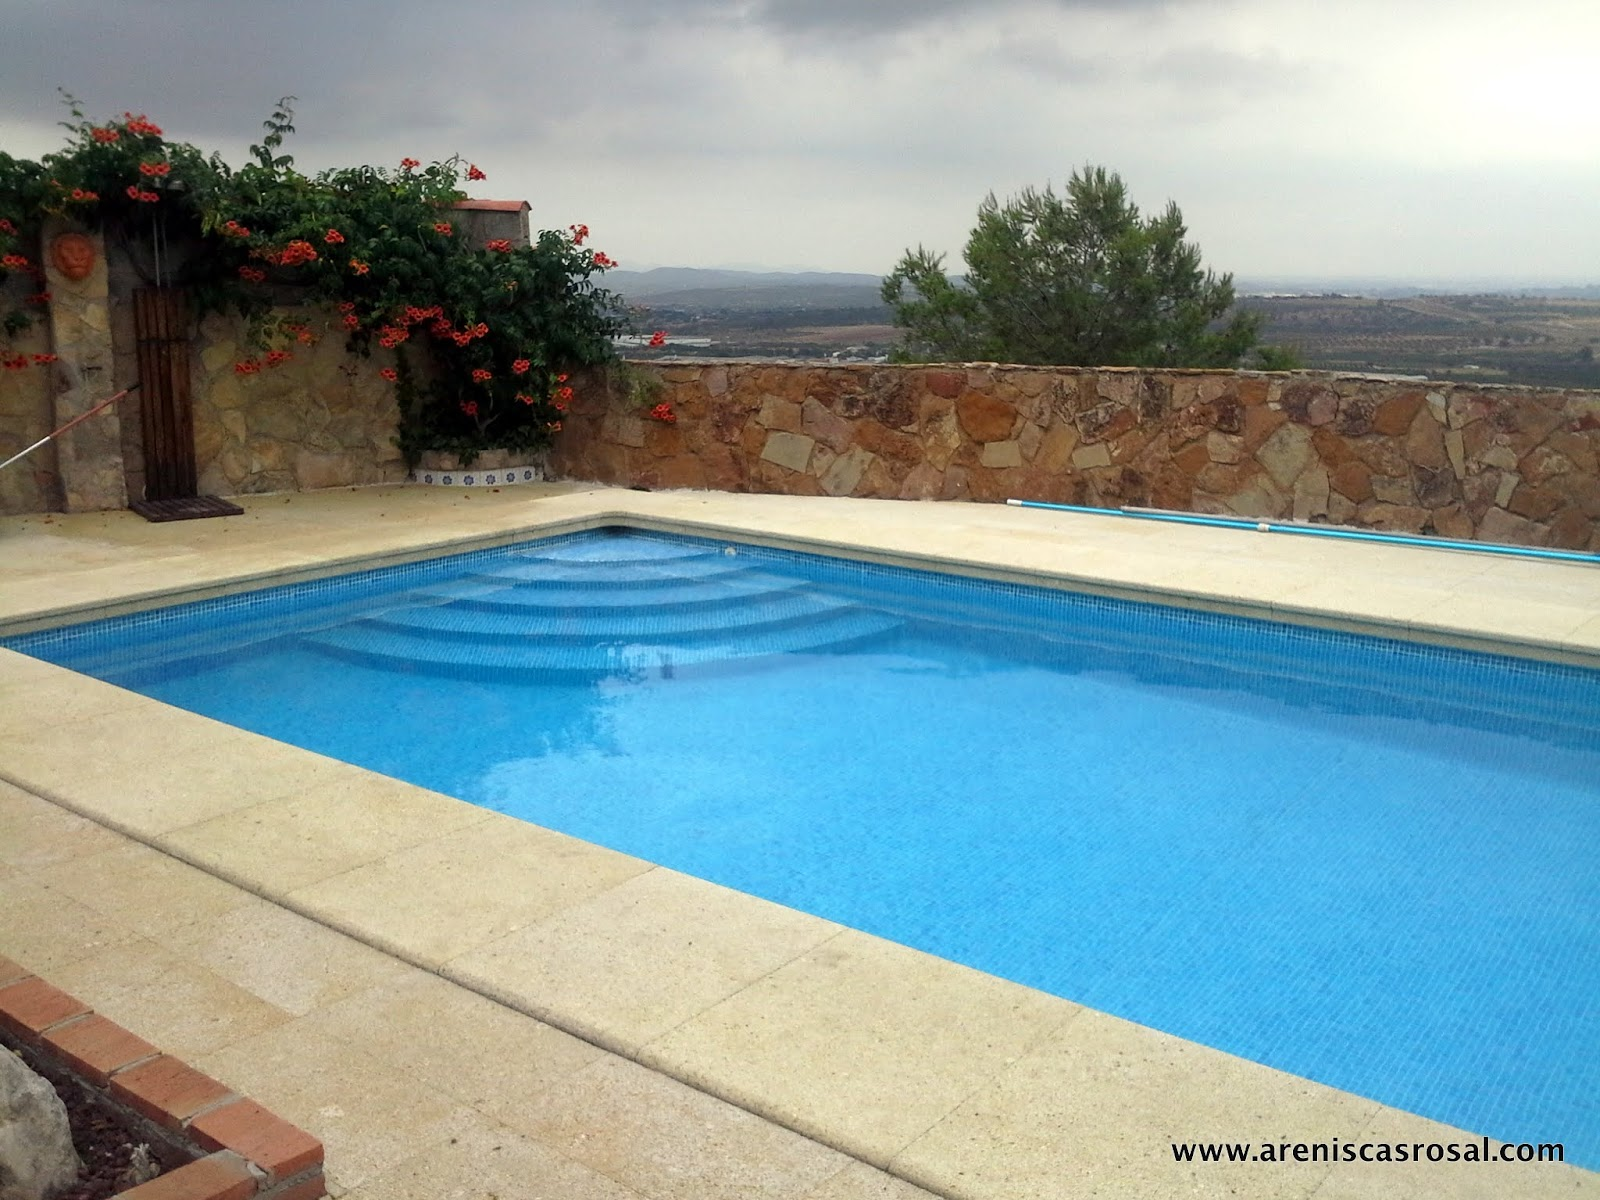 Coronacion de piscina y pavimento albamiel areniscas rosal s a - Coronacion de piscinas ...